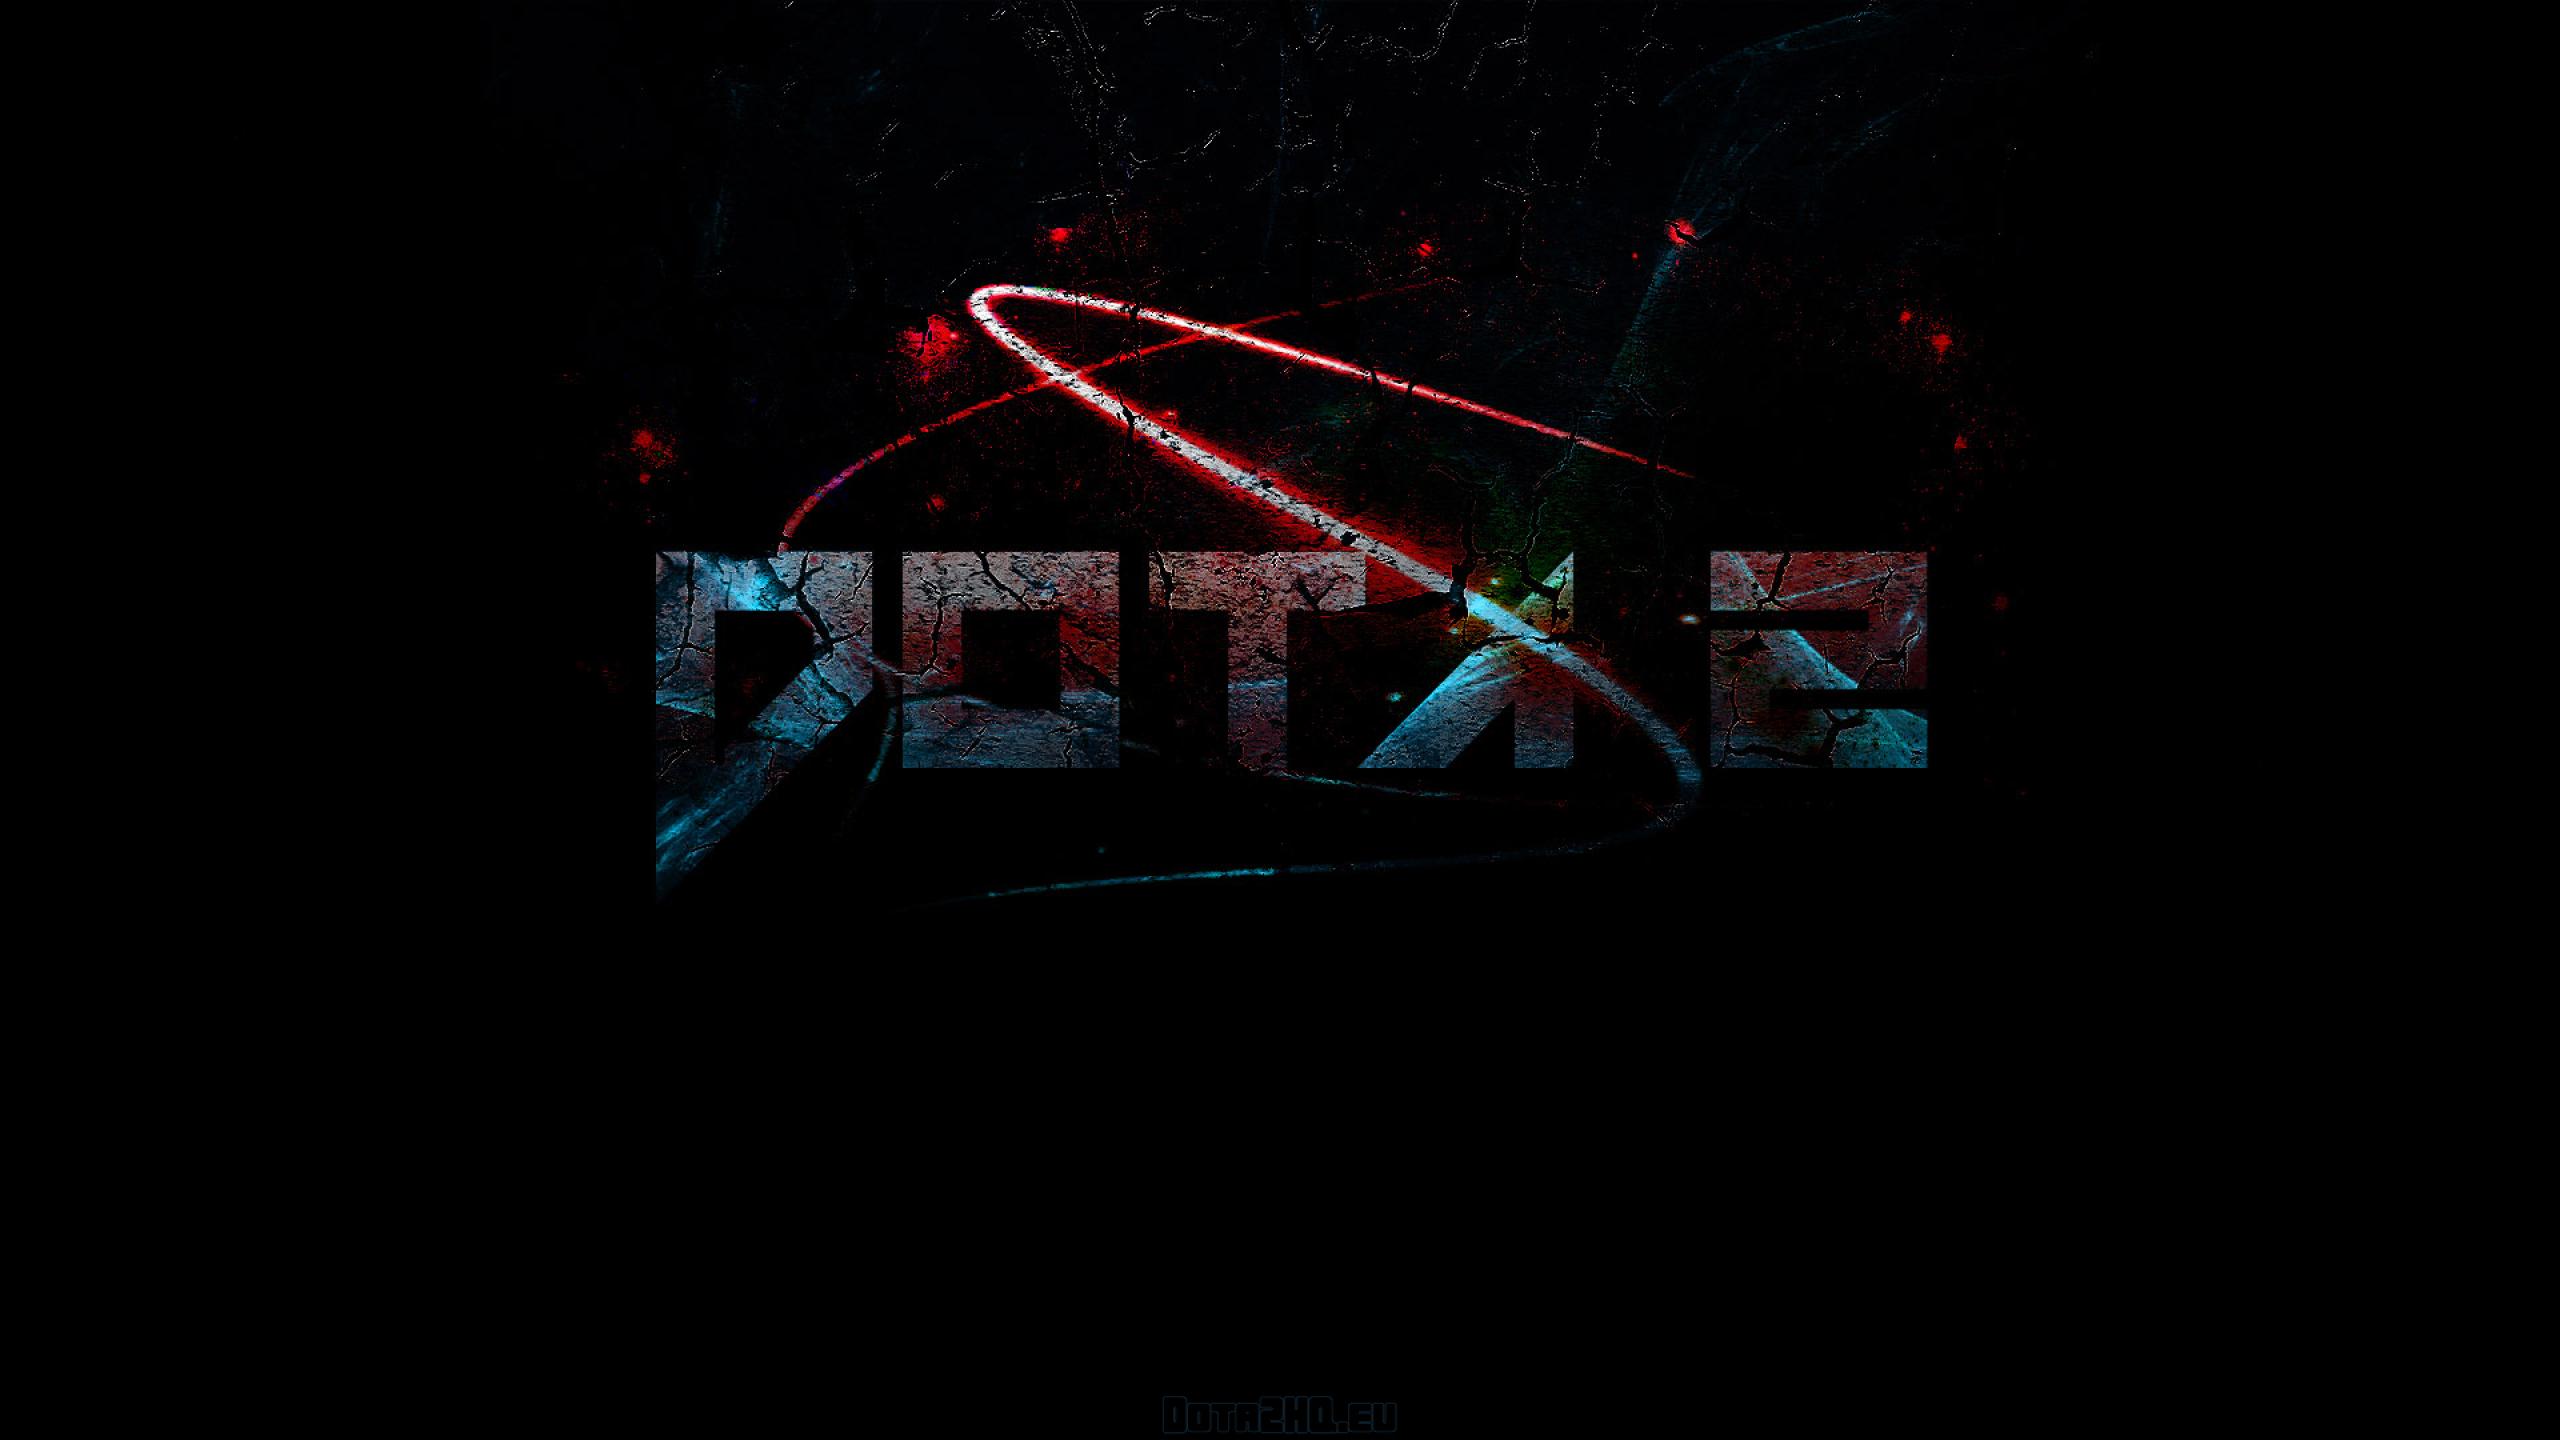 2560x1440 Dota 2 Logo Game 1440p Resolution Wallpaper Hd Games